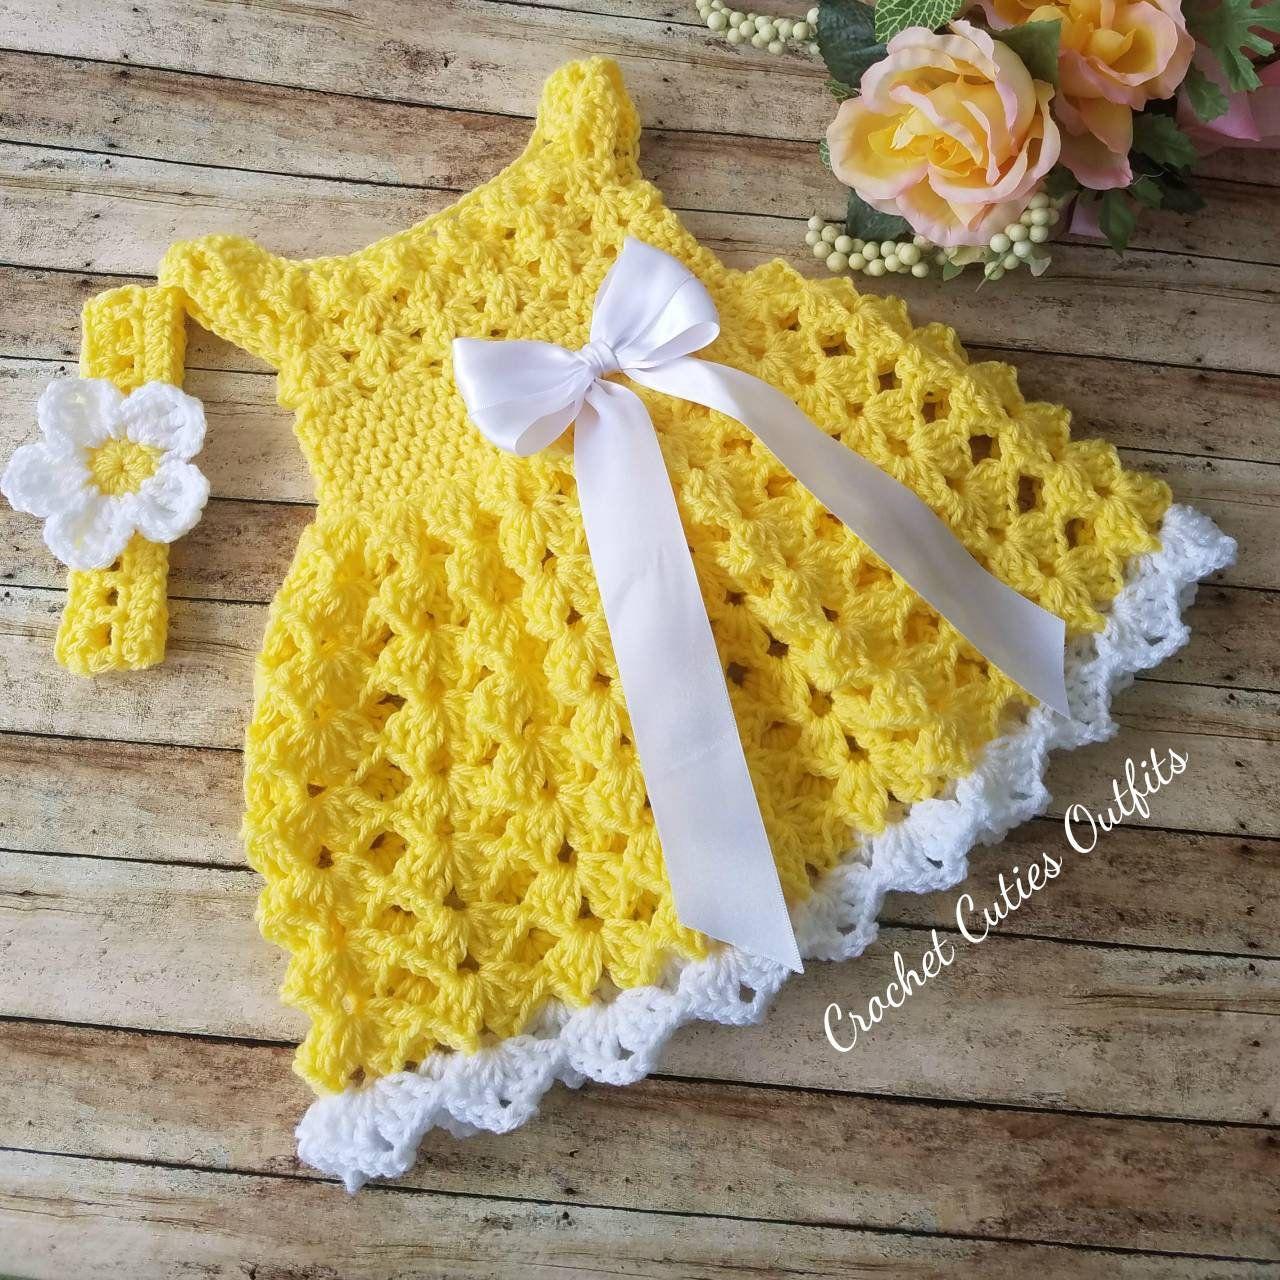 Baby Dress Baby Gift Vestido de Bebe Crochet Bebe Handmade Baby Girl Dress,Crochet Baby Dress Dresses with Flowers Infant Dresses